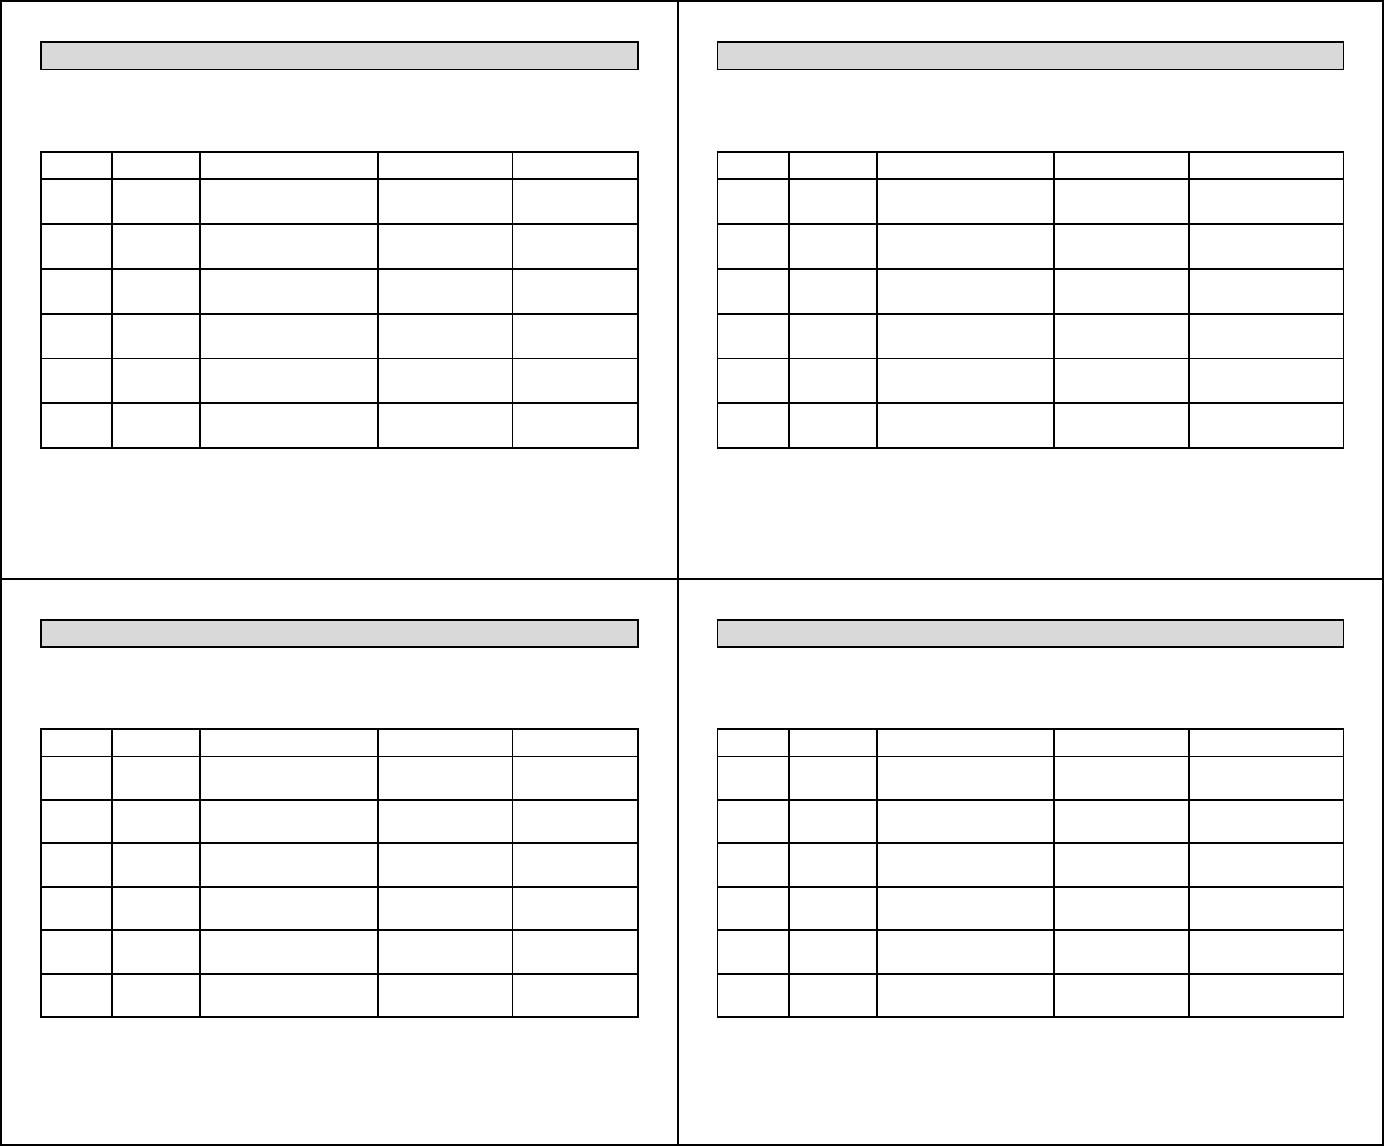 Free Euchre Player Score Card Pdf 174kb 1 Page S